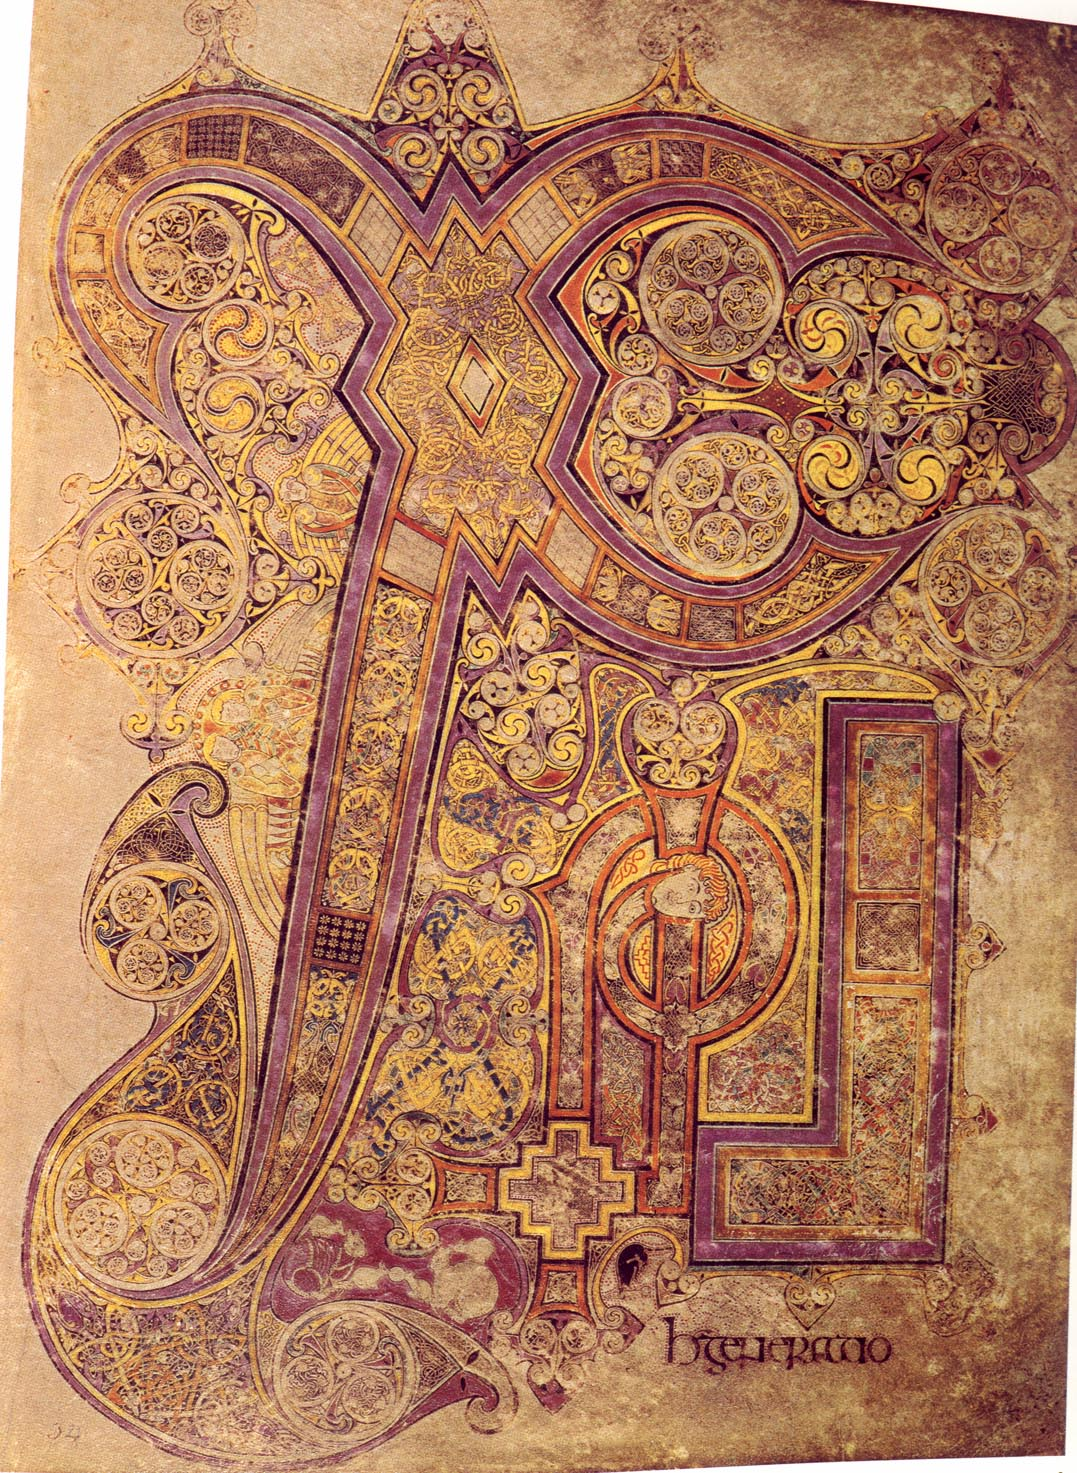 essay on the book of kells